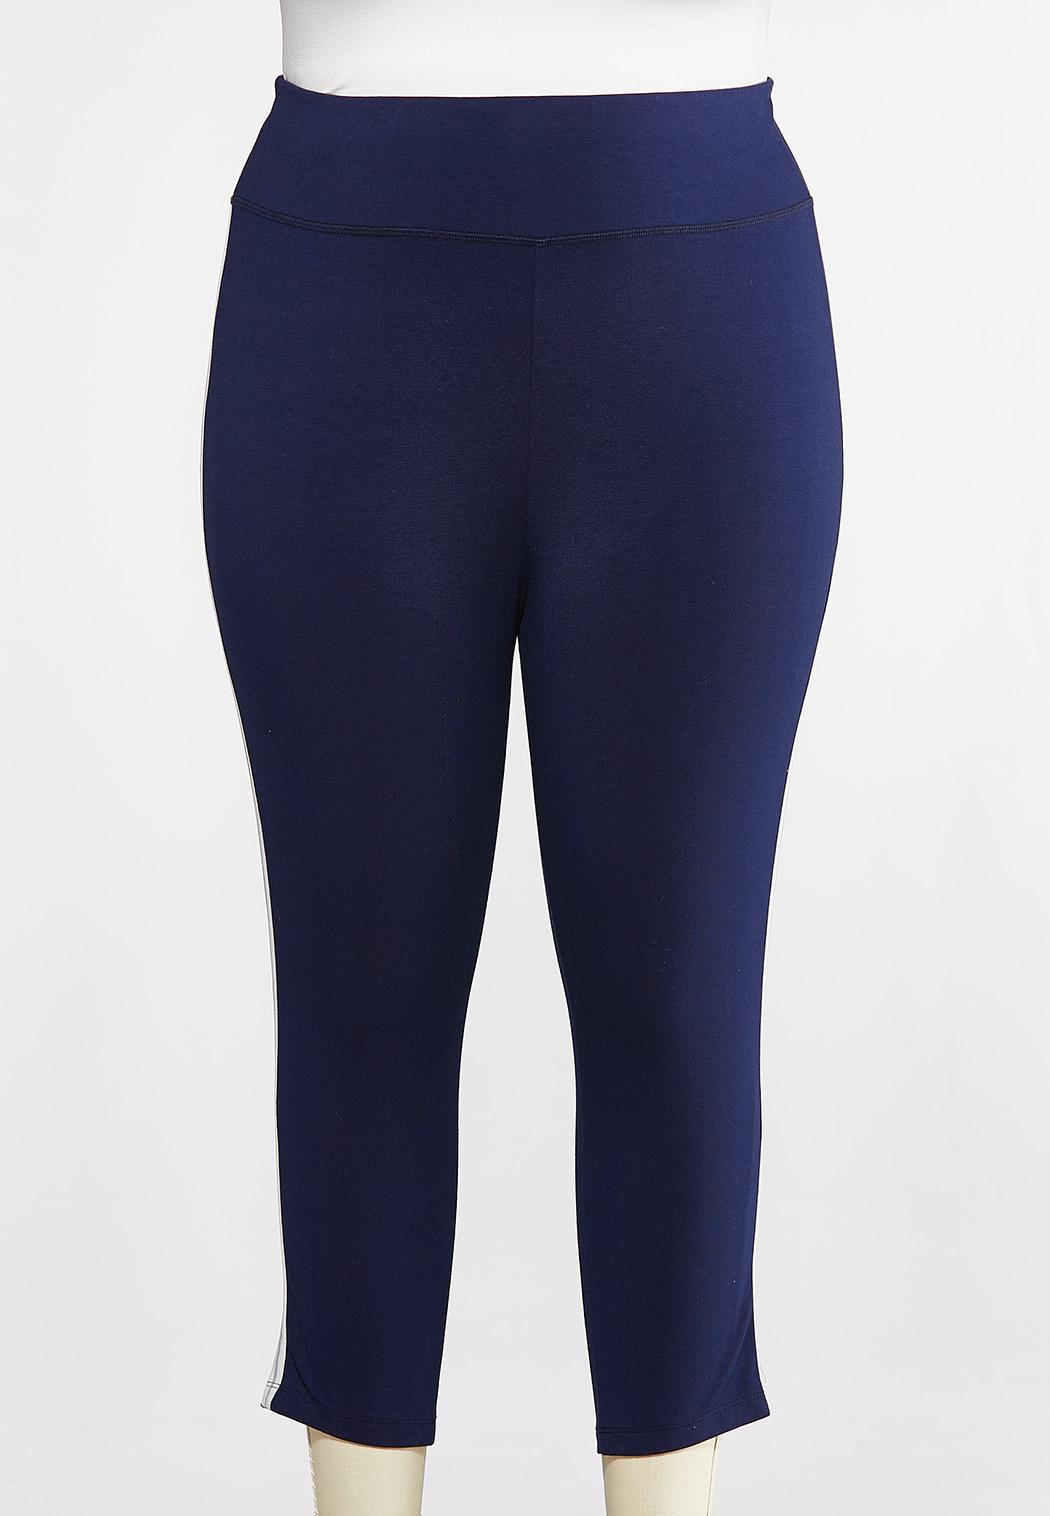 Plus Size Cropped Sporty Leggings